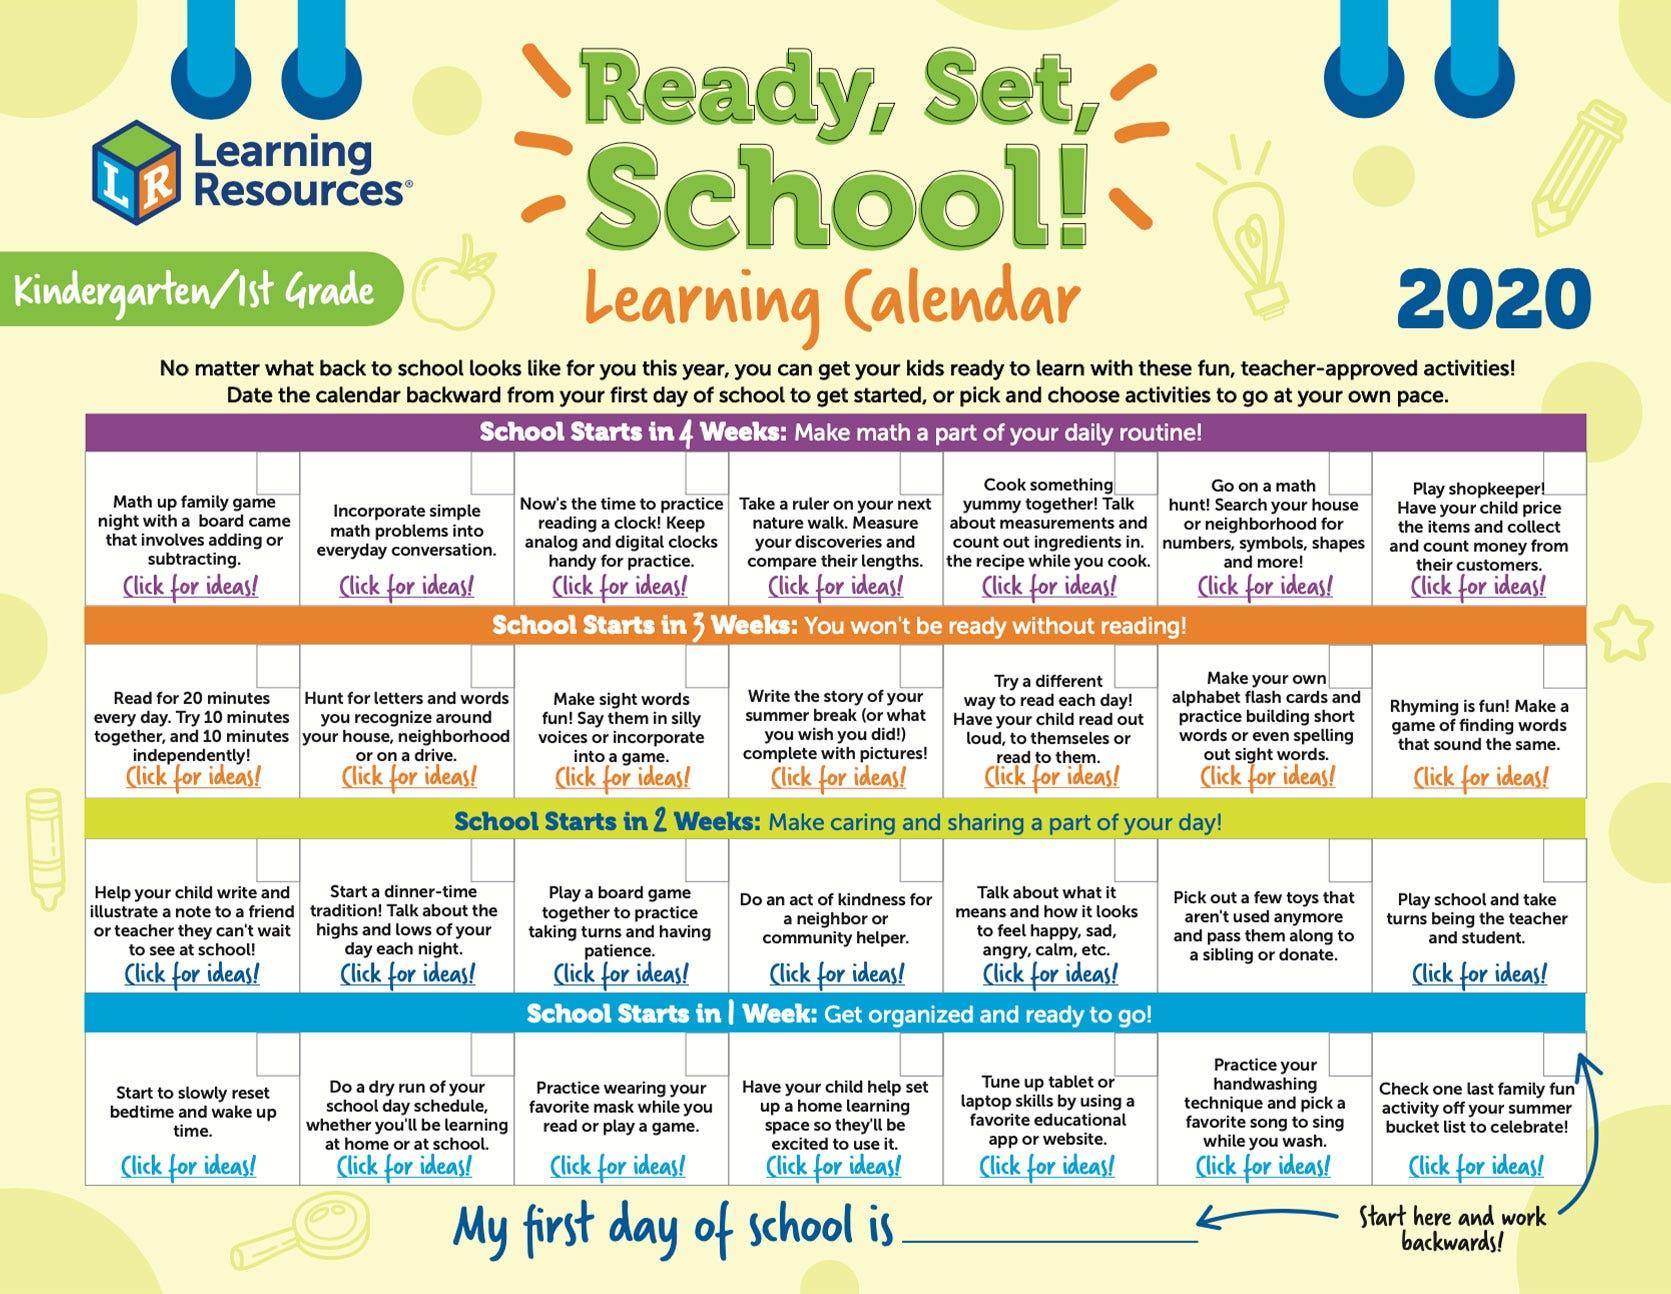 Kindergarten/1st Grade Learning Calendar